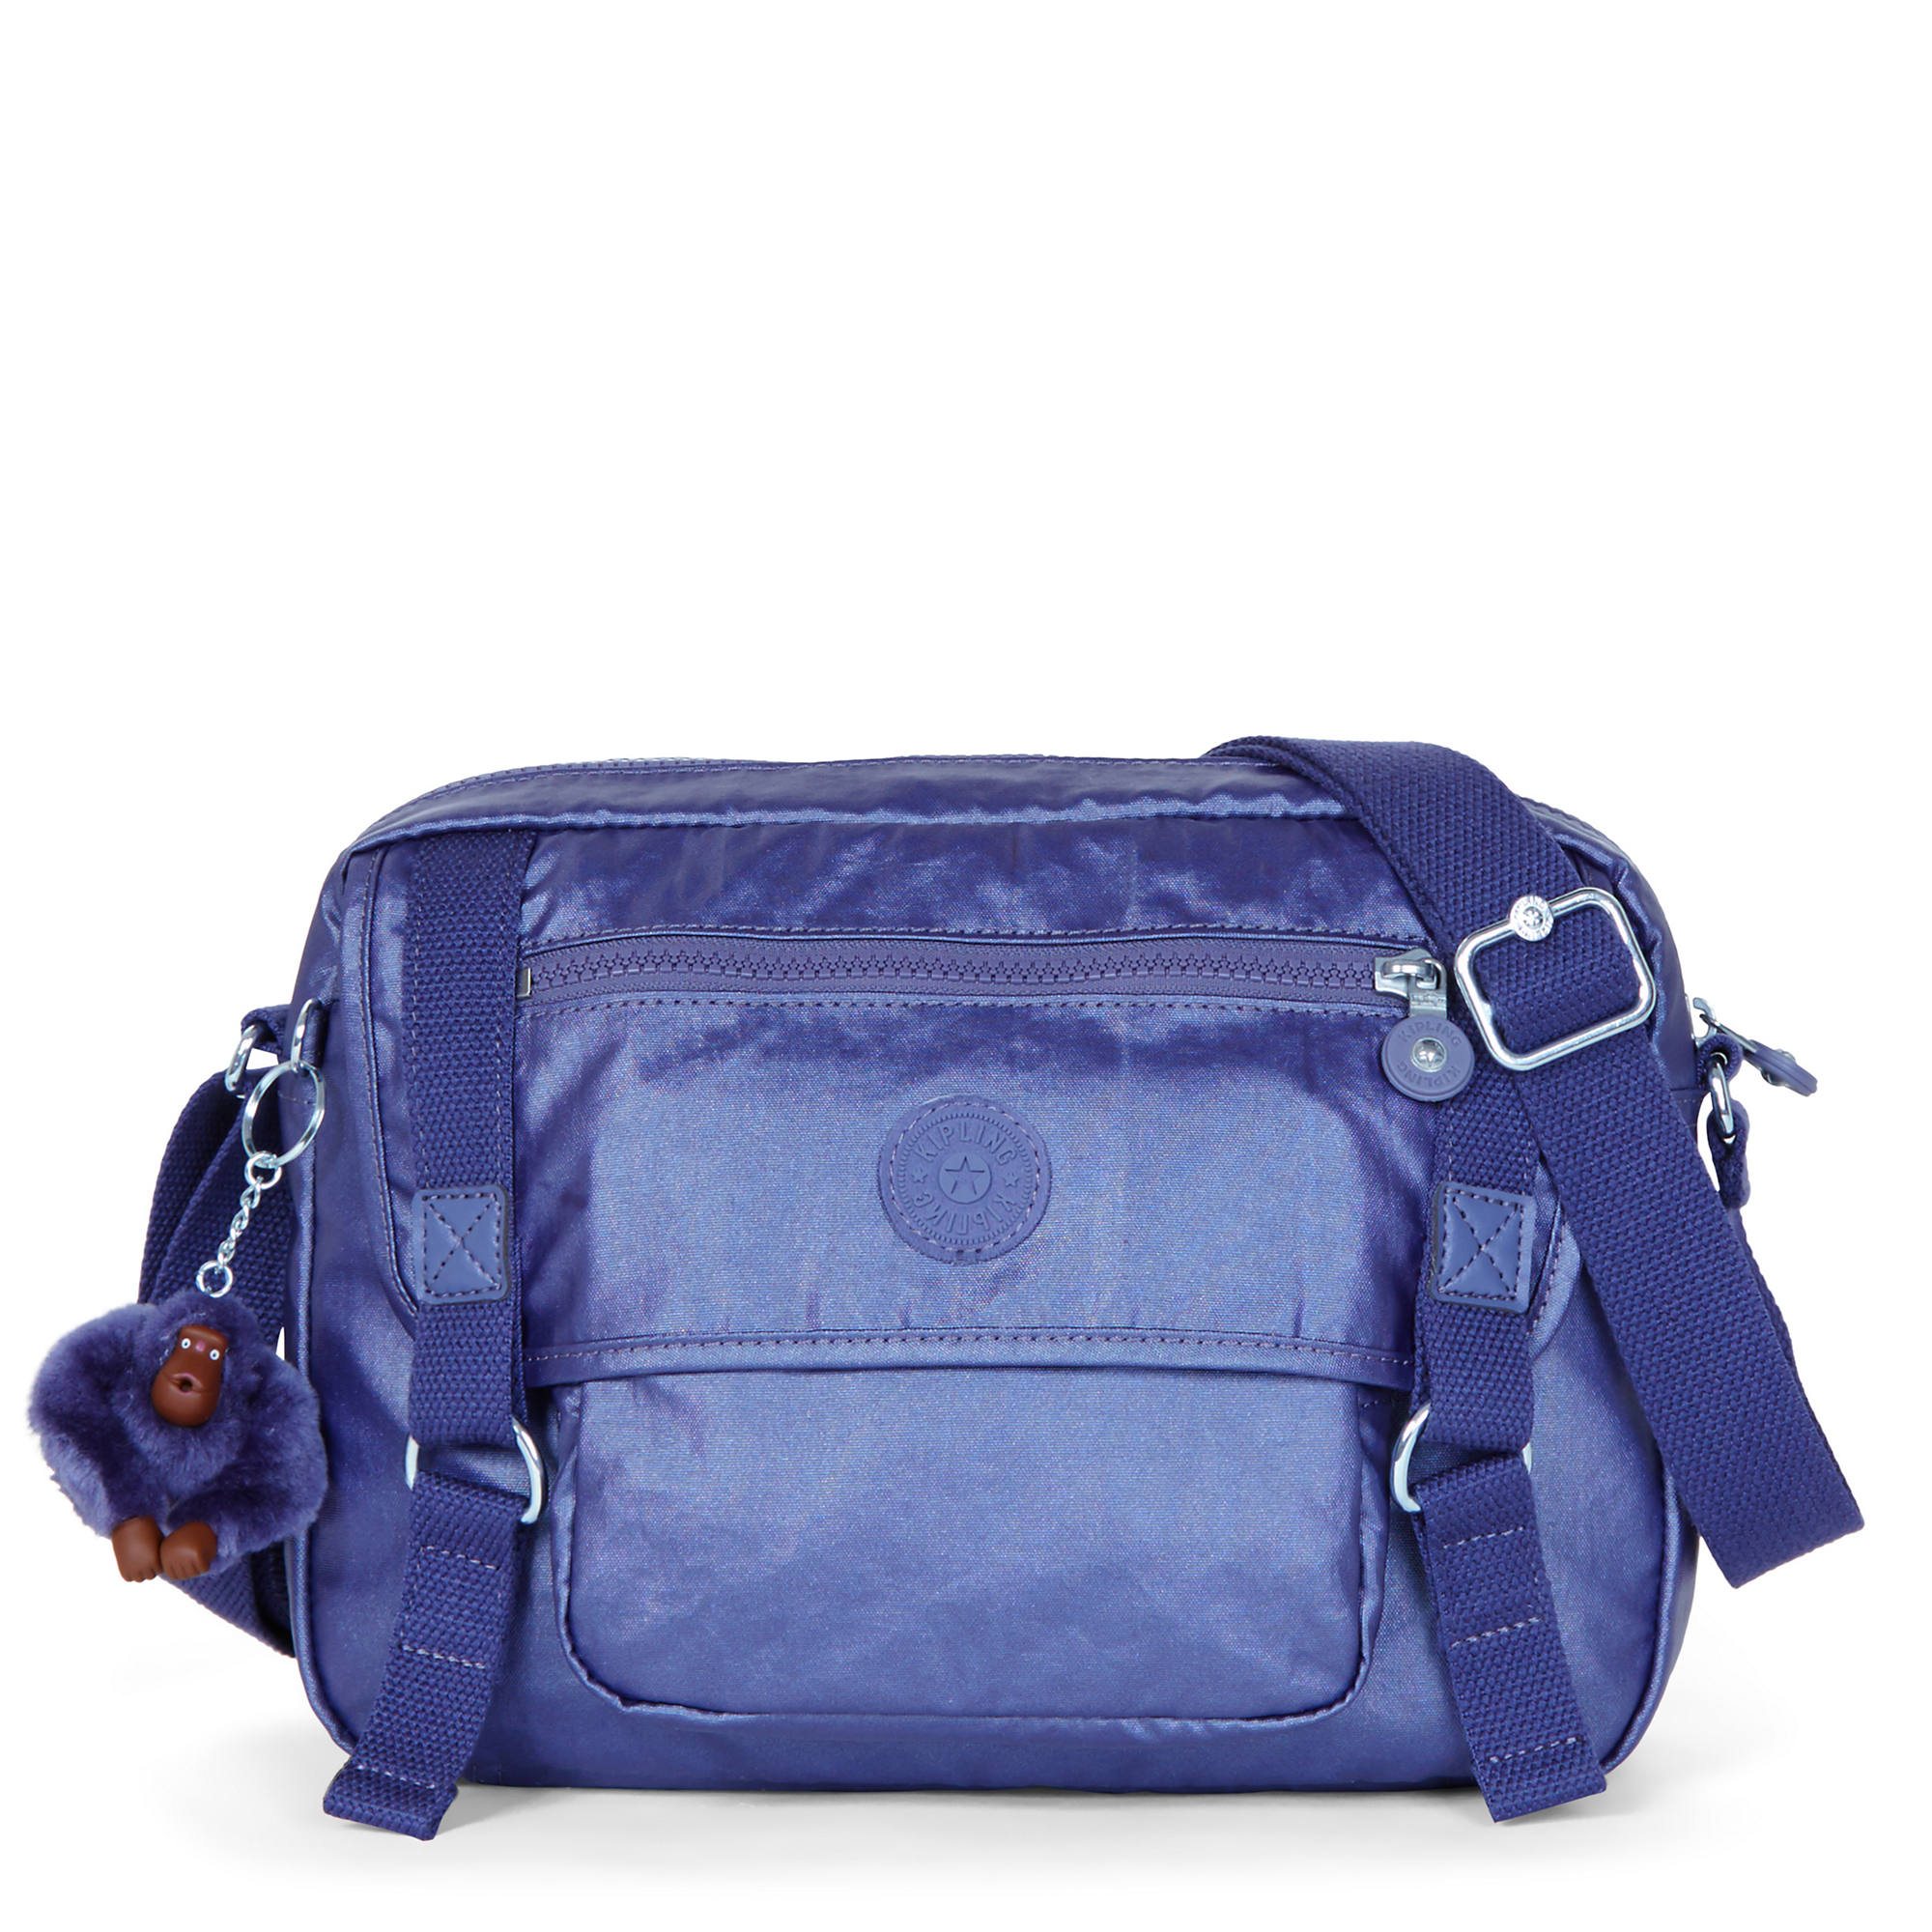 5070a6c64 Gracy Crossbody Bag,Enchanted Purple Metallic,large